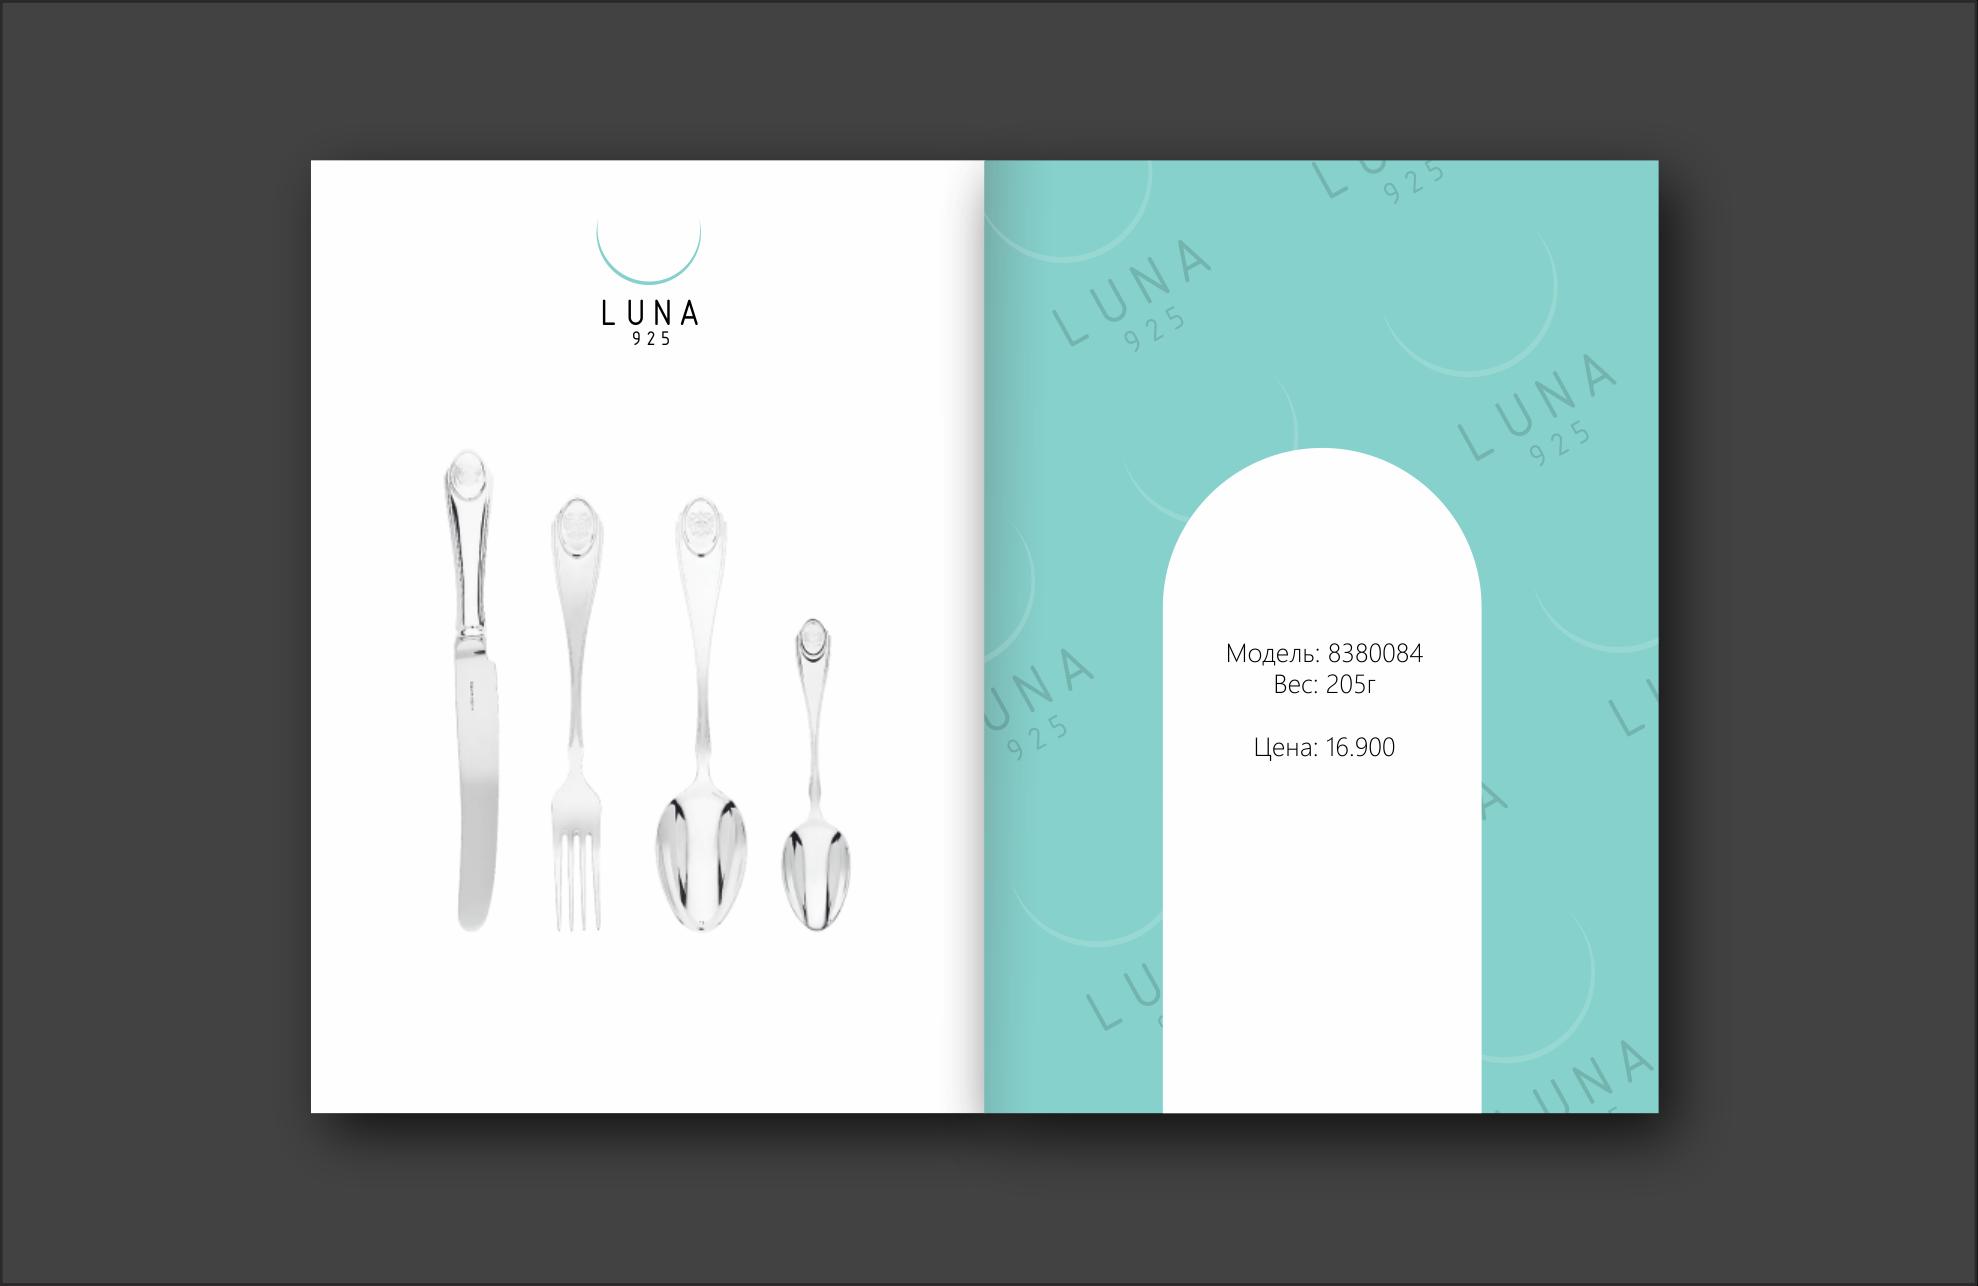 Логотип для столового серебра и посуды из серебра фото f_0175baced386b3f8.png